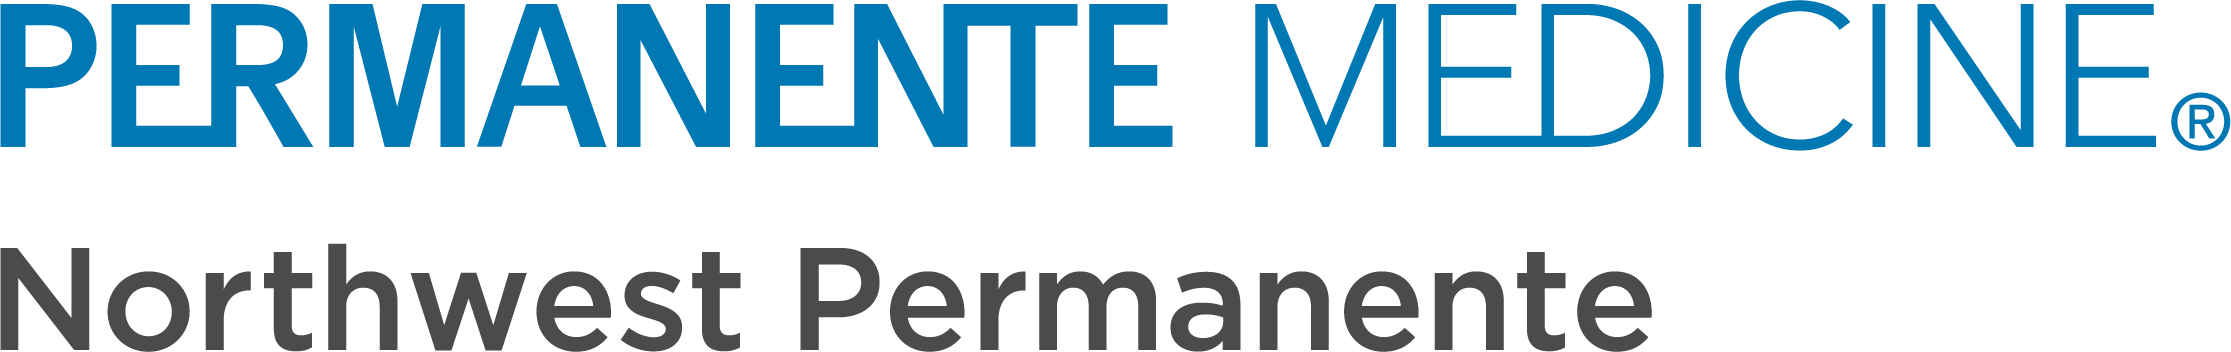 Logo for Northwest Permanente